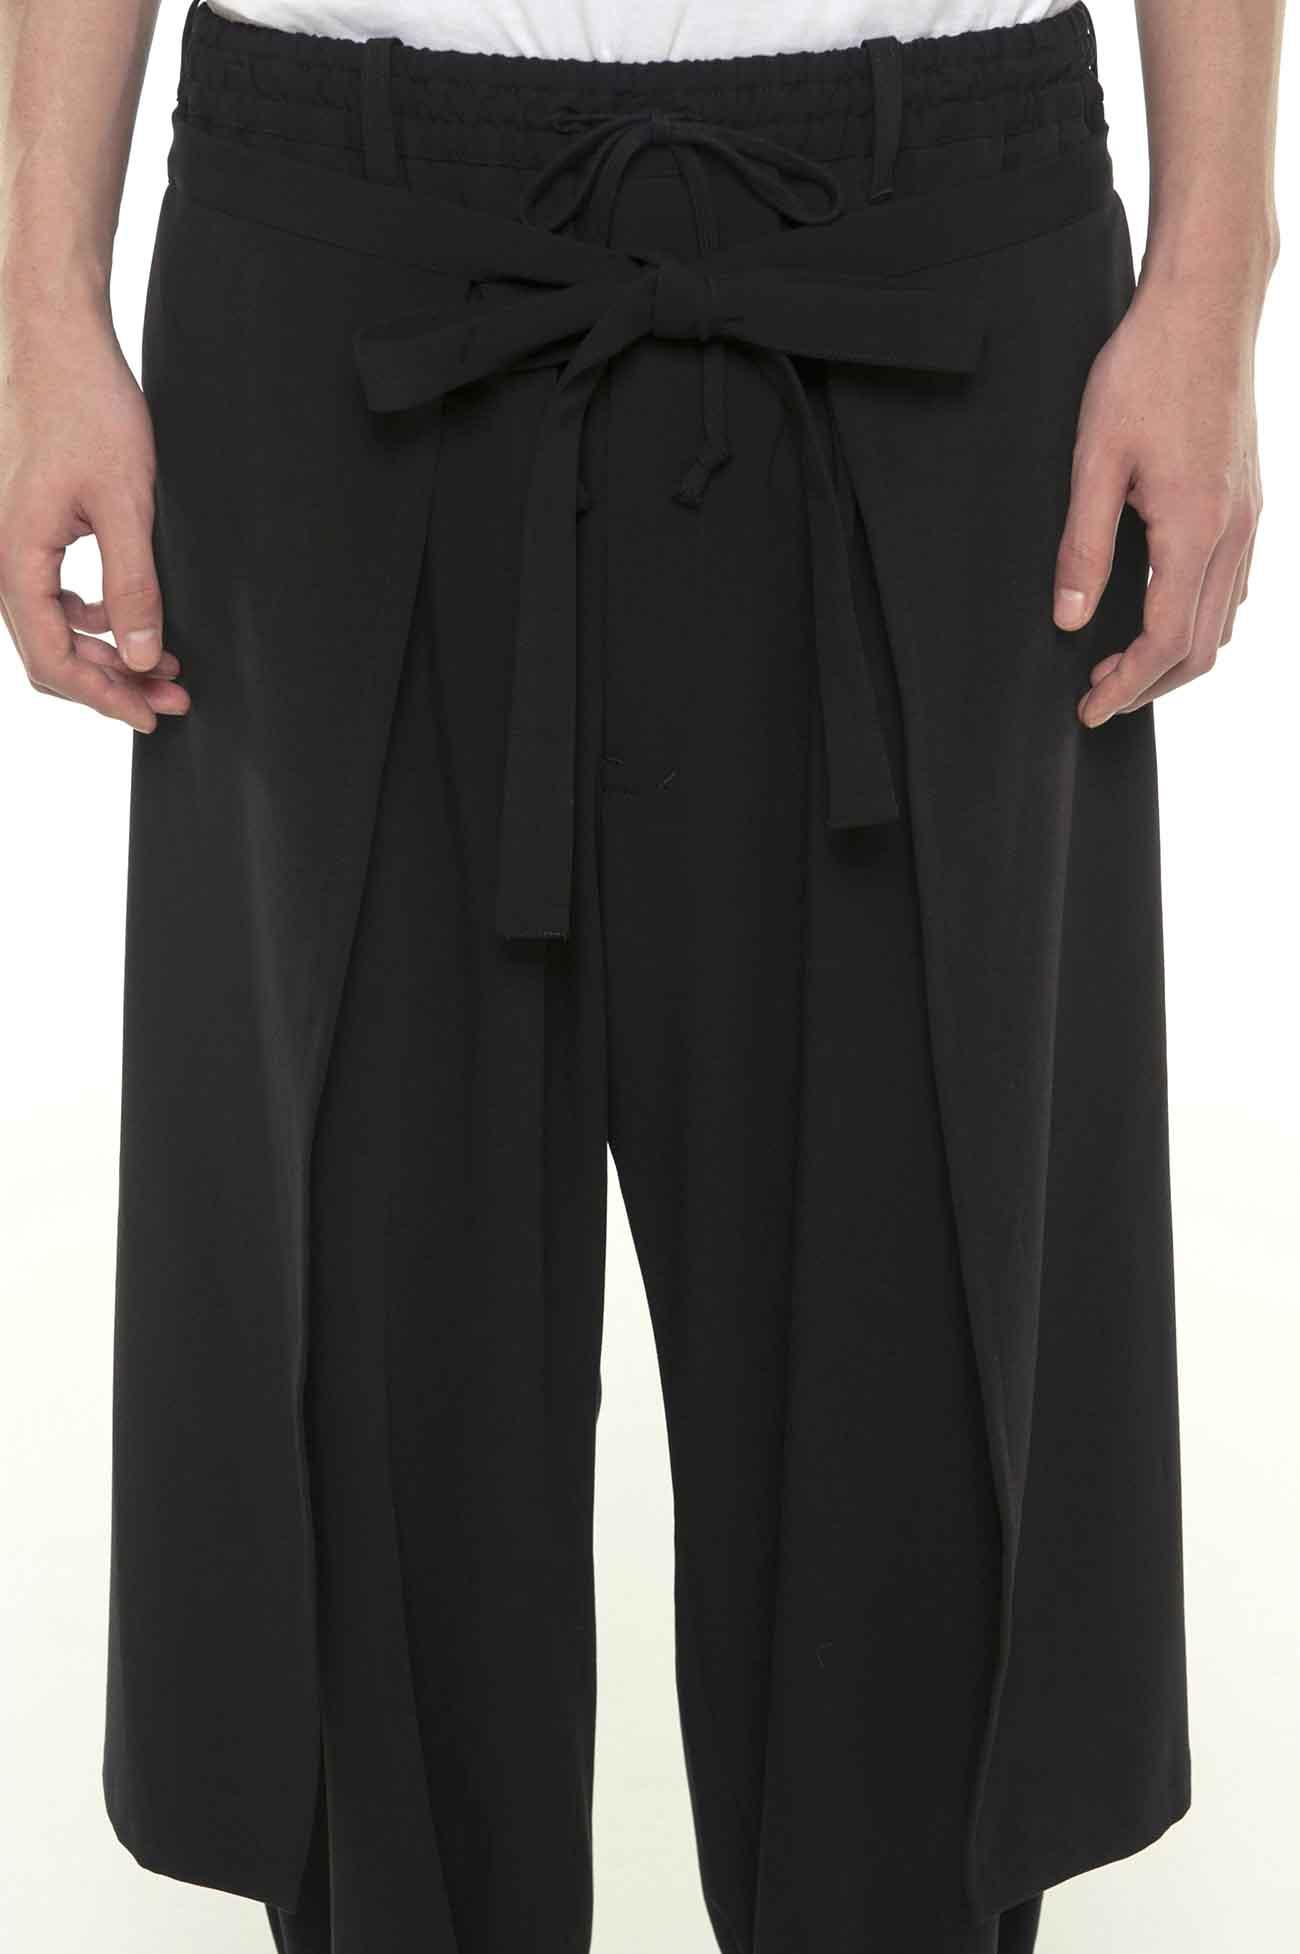 Pe/Rayon Gabardine Stretc Hem Both Sides Wrap Pants